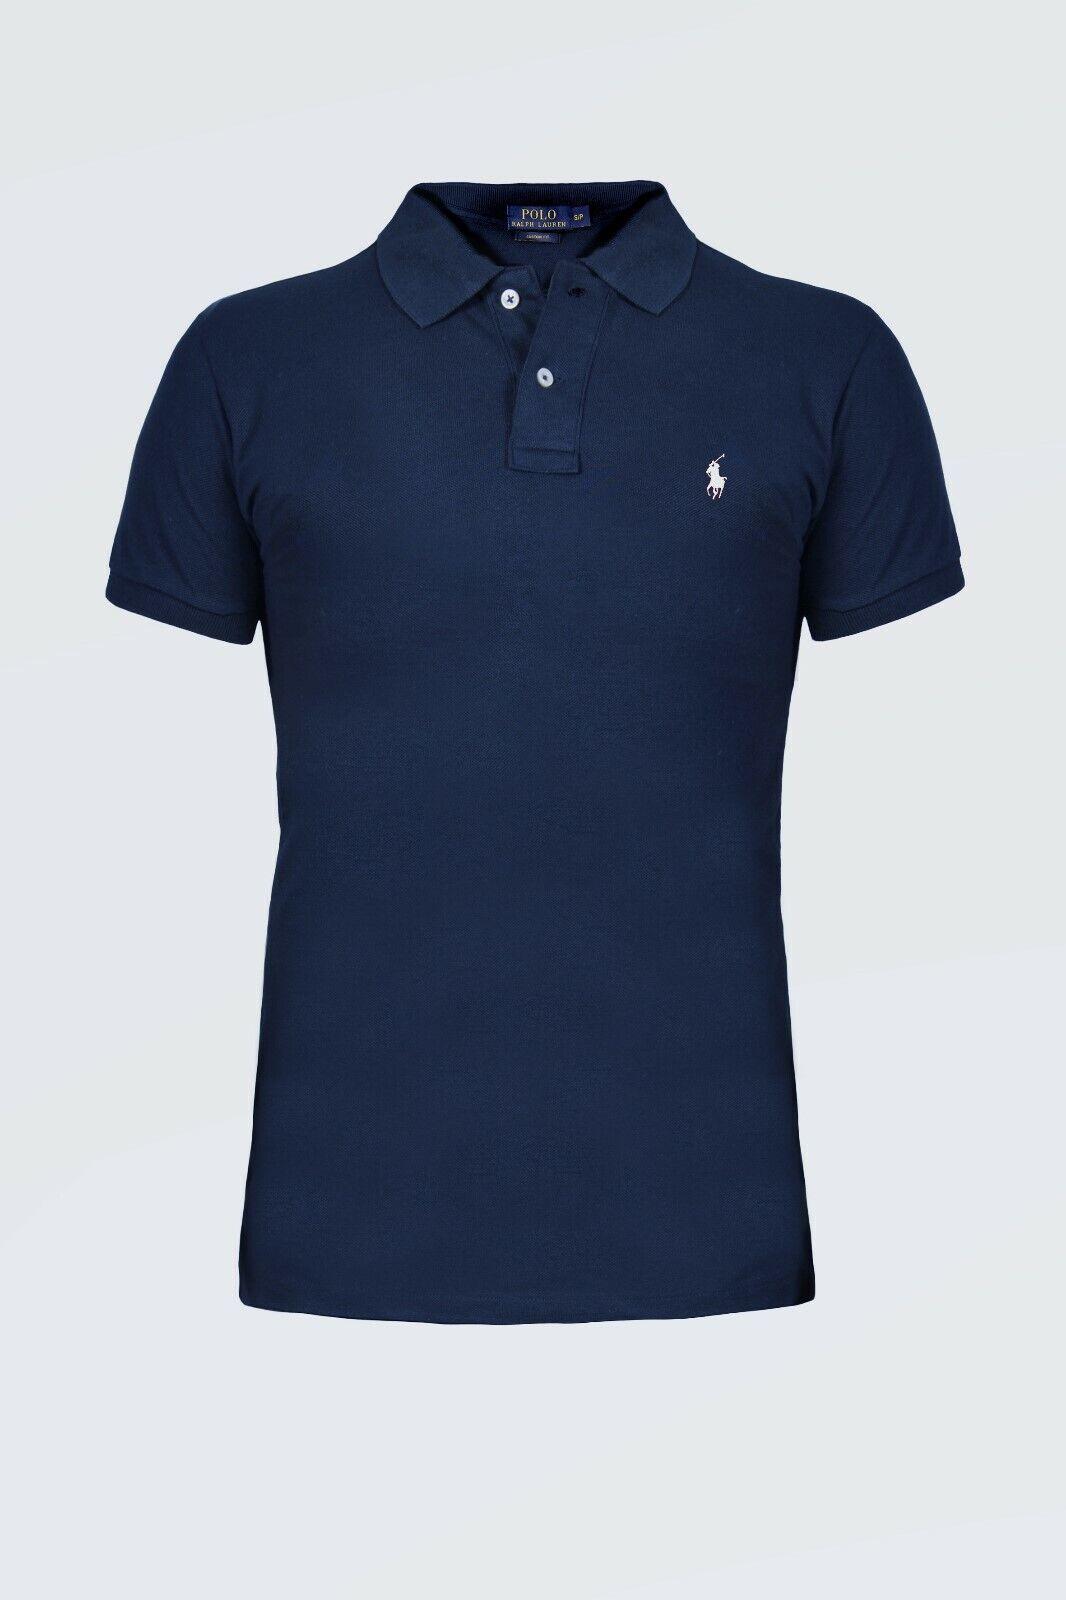 Ralph Lauren, Herren Poloshirt, OVP, Custom Fit, Neu, Navy